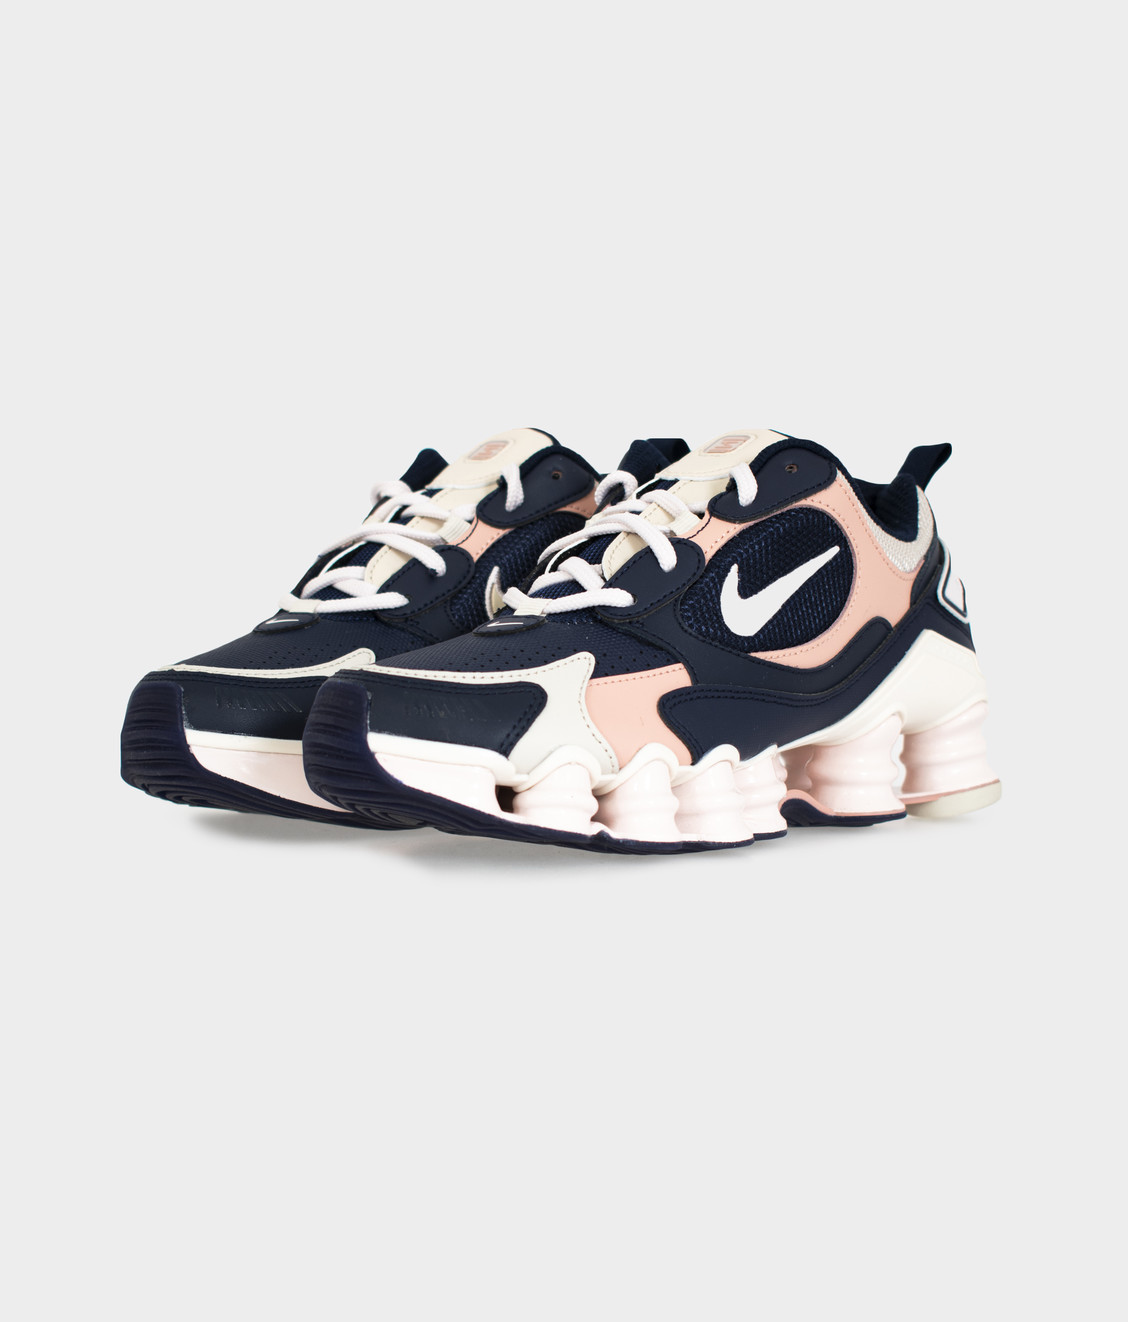 Nike Nike Shox TL Nova Blue Orewood